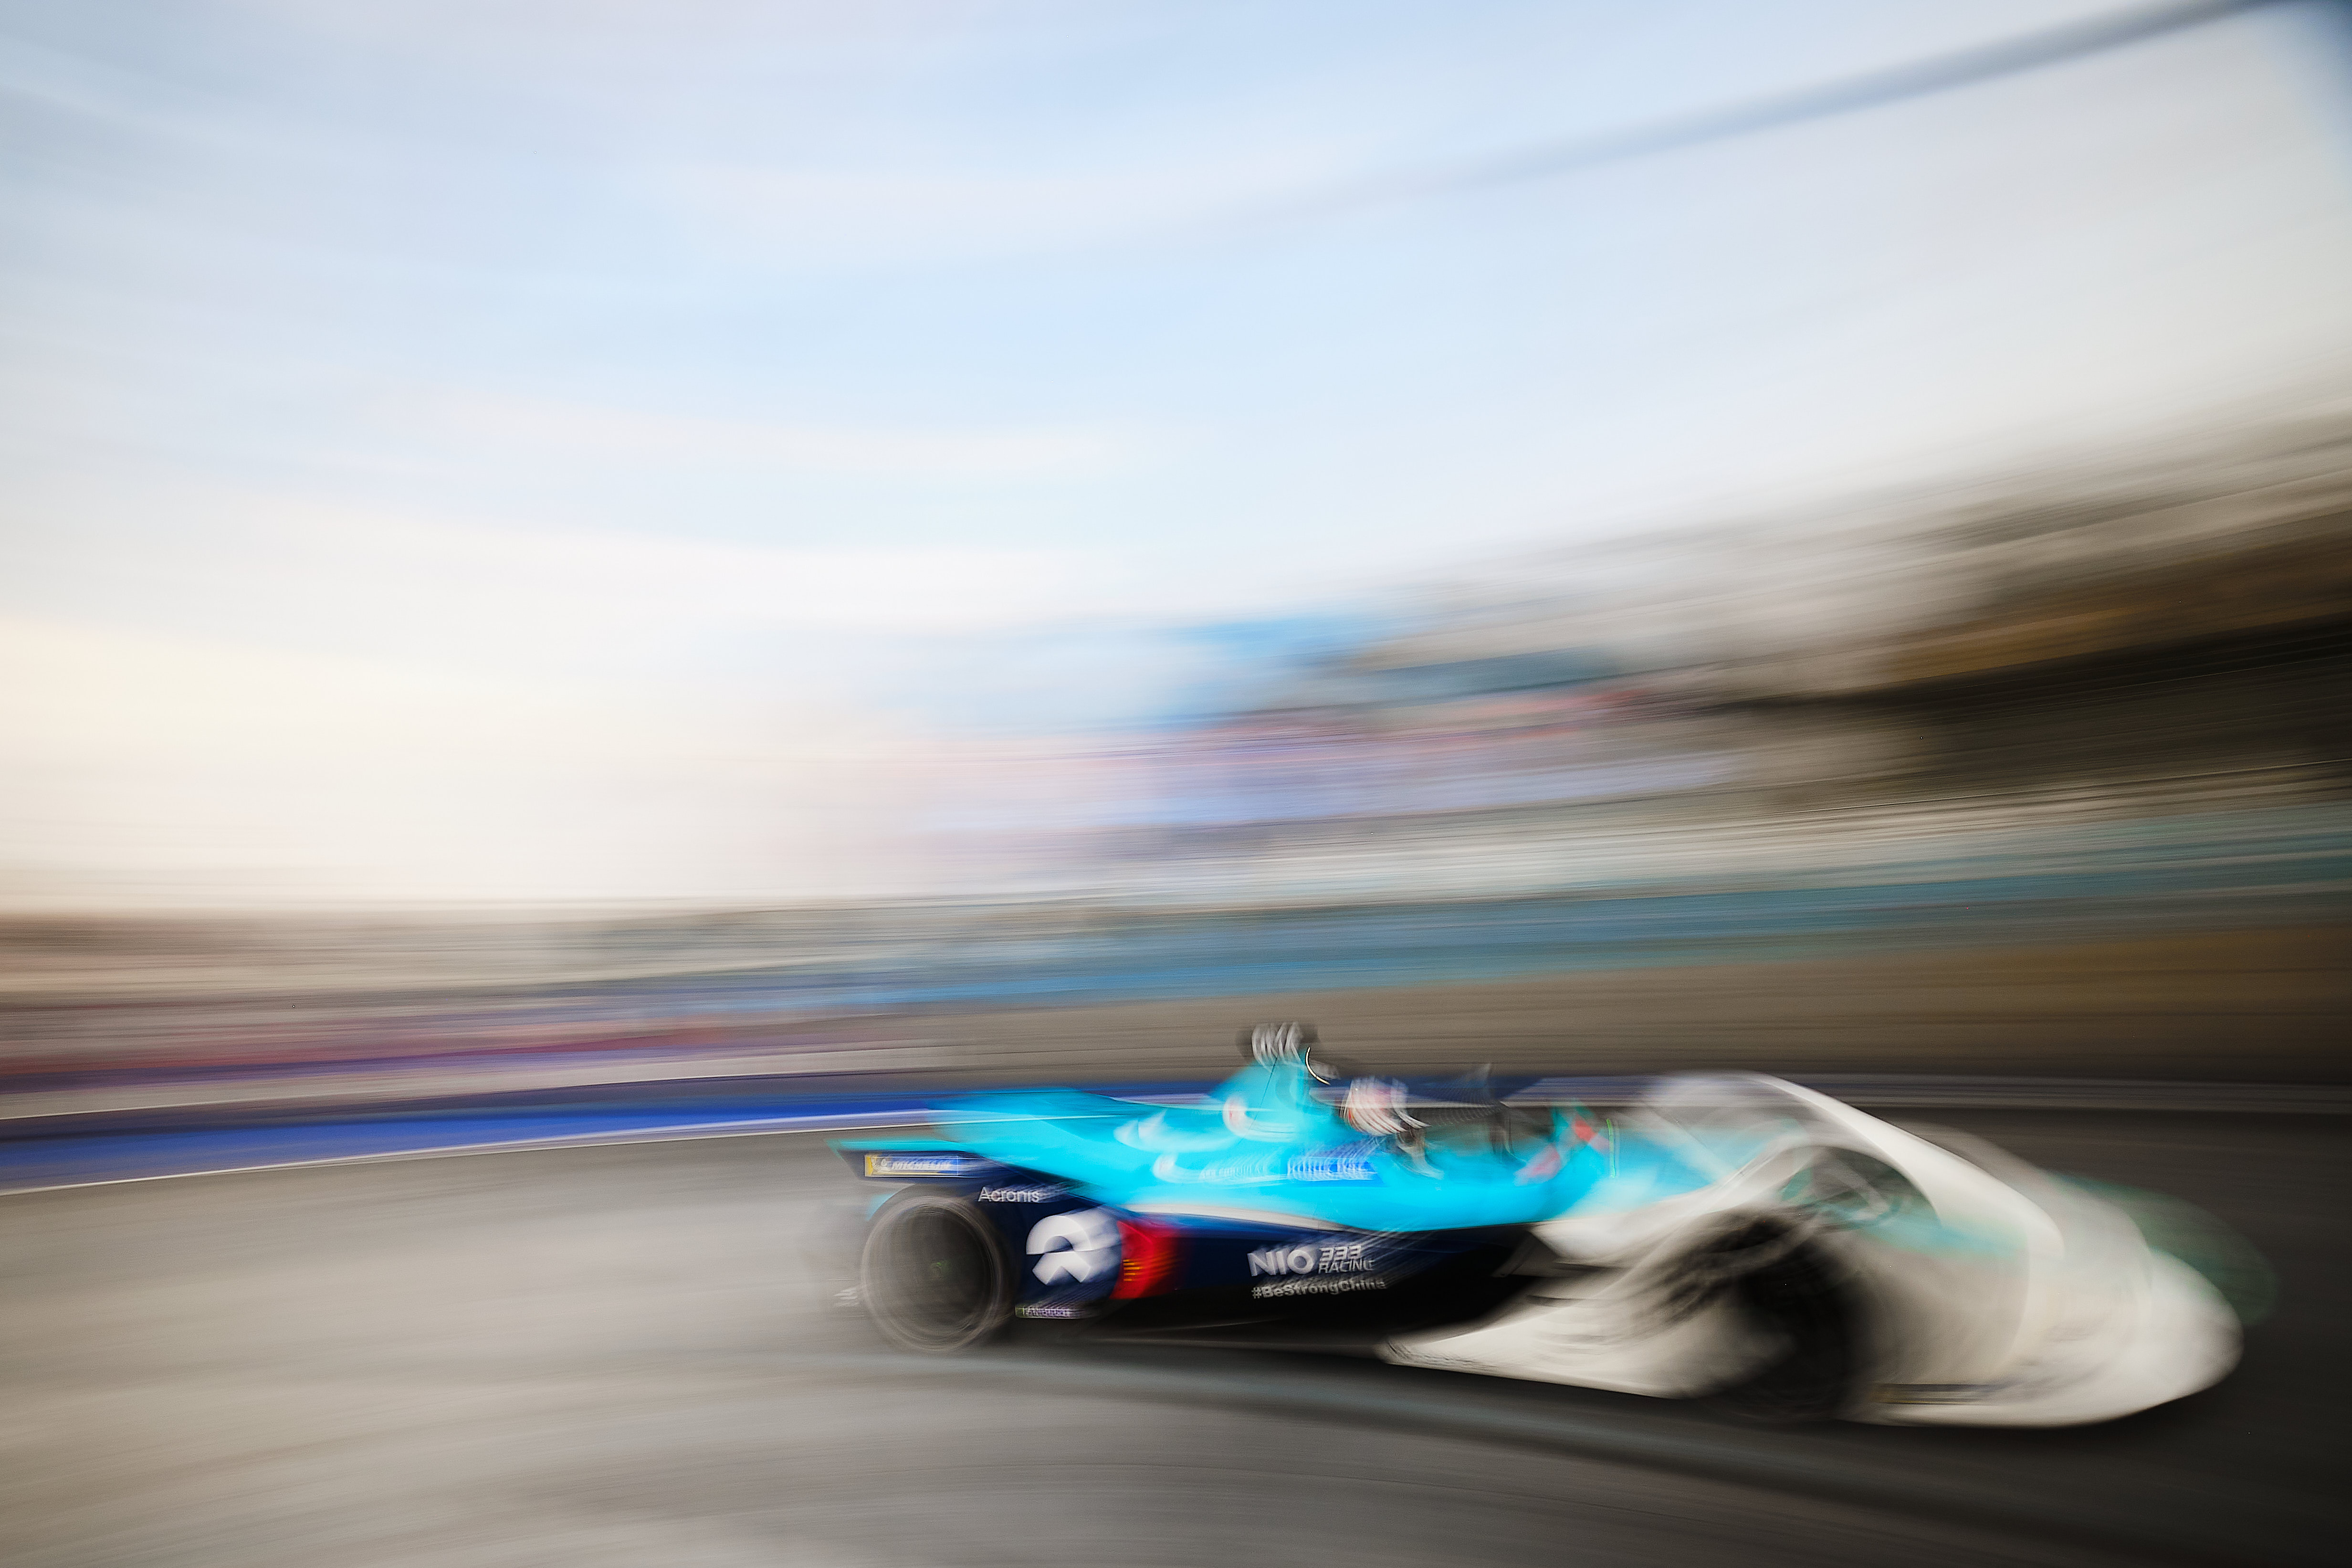 Ma Qing Hua NIO333 Mexico City Formula E 2020